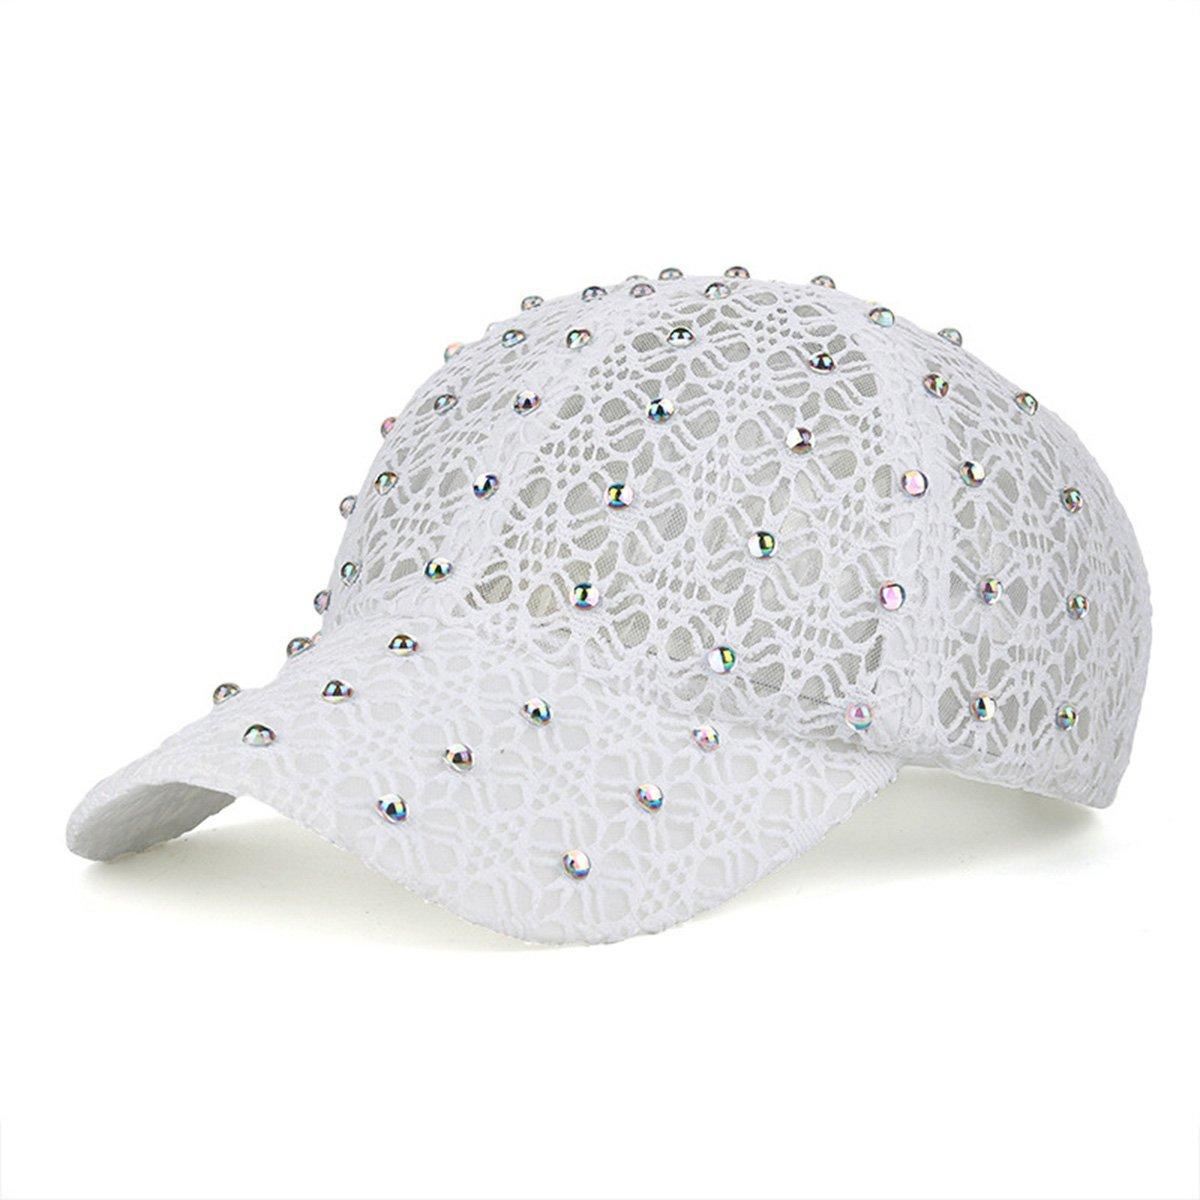 Himozoo Women Fashion Baseball Cap, Luxury Bling Lace Adjustable Sport Baseball Hat